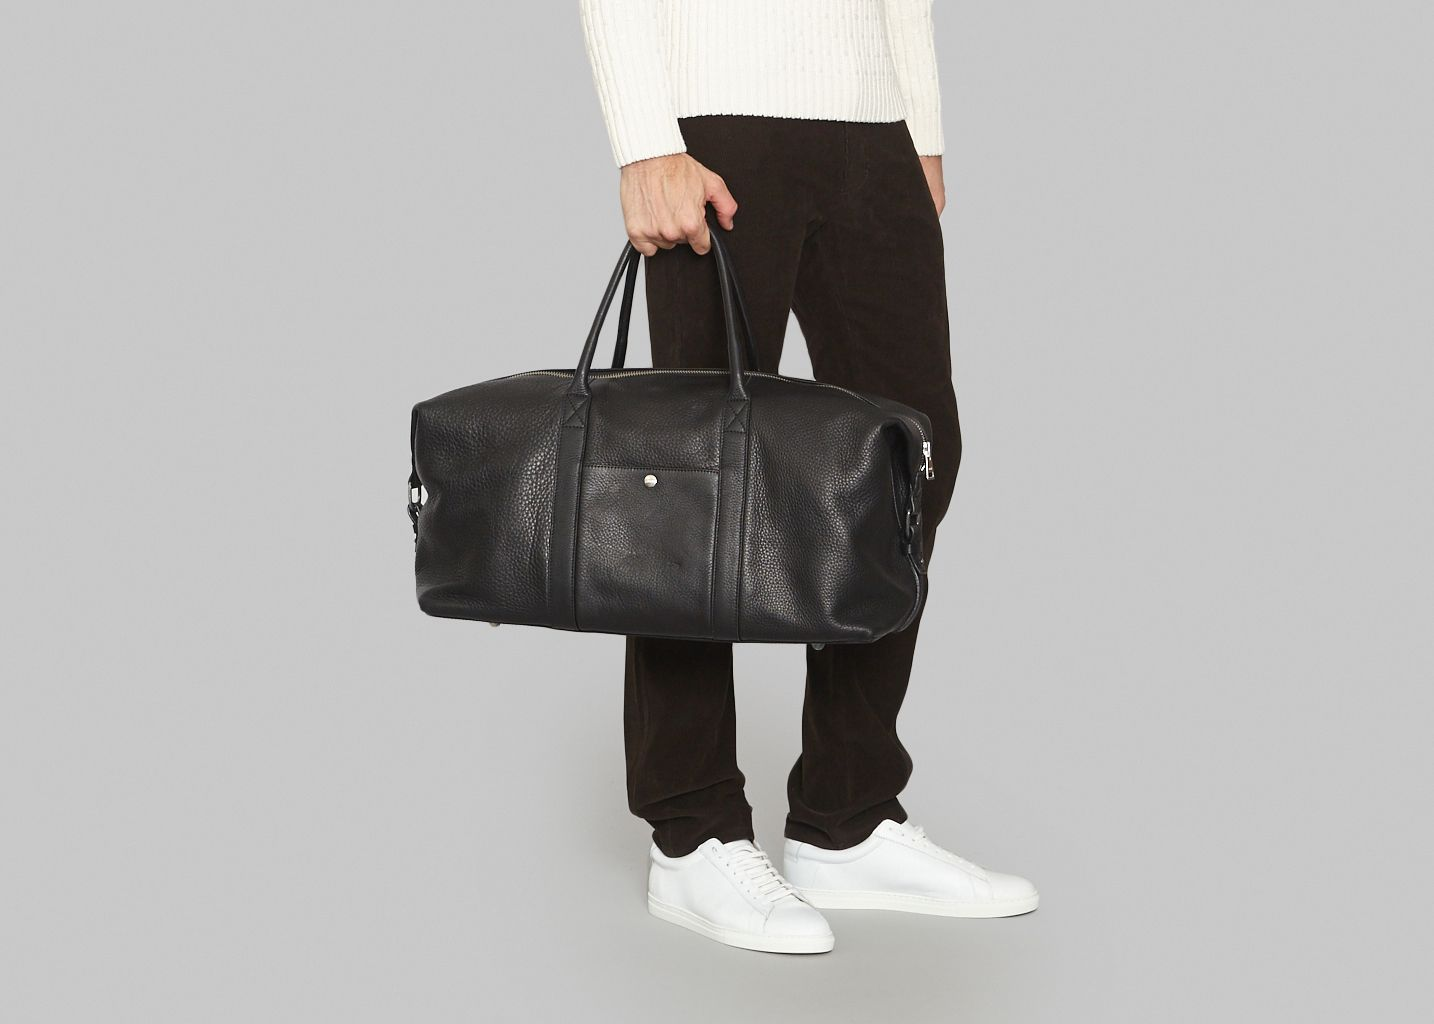 Weekender Bag - AMI Alexandre Mattiussi